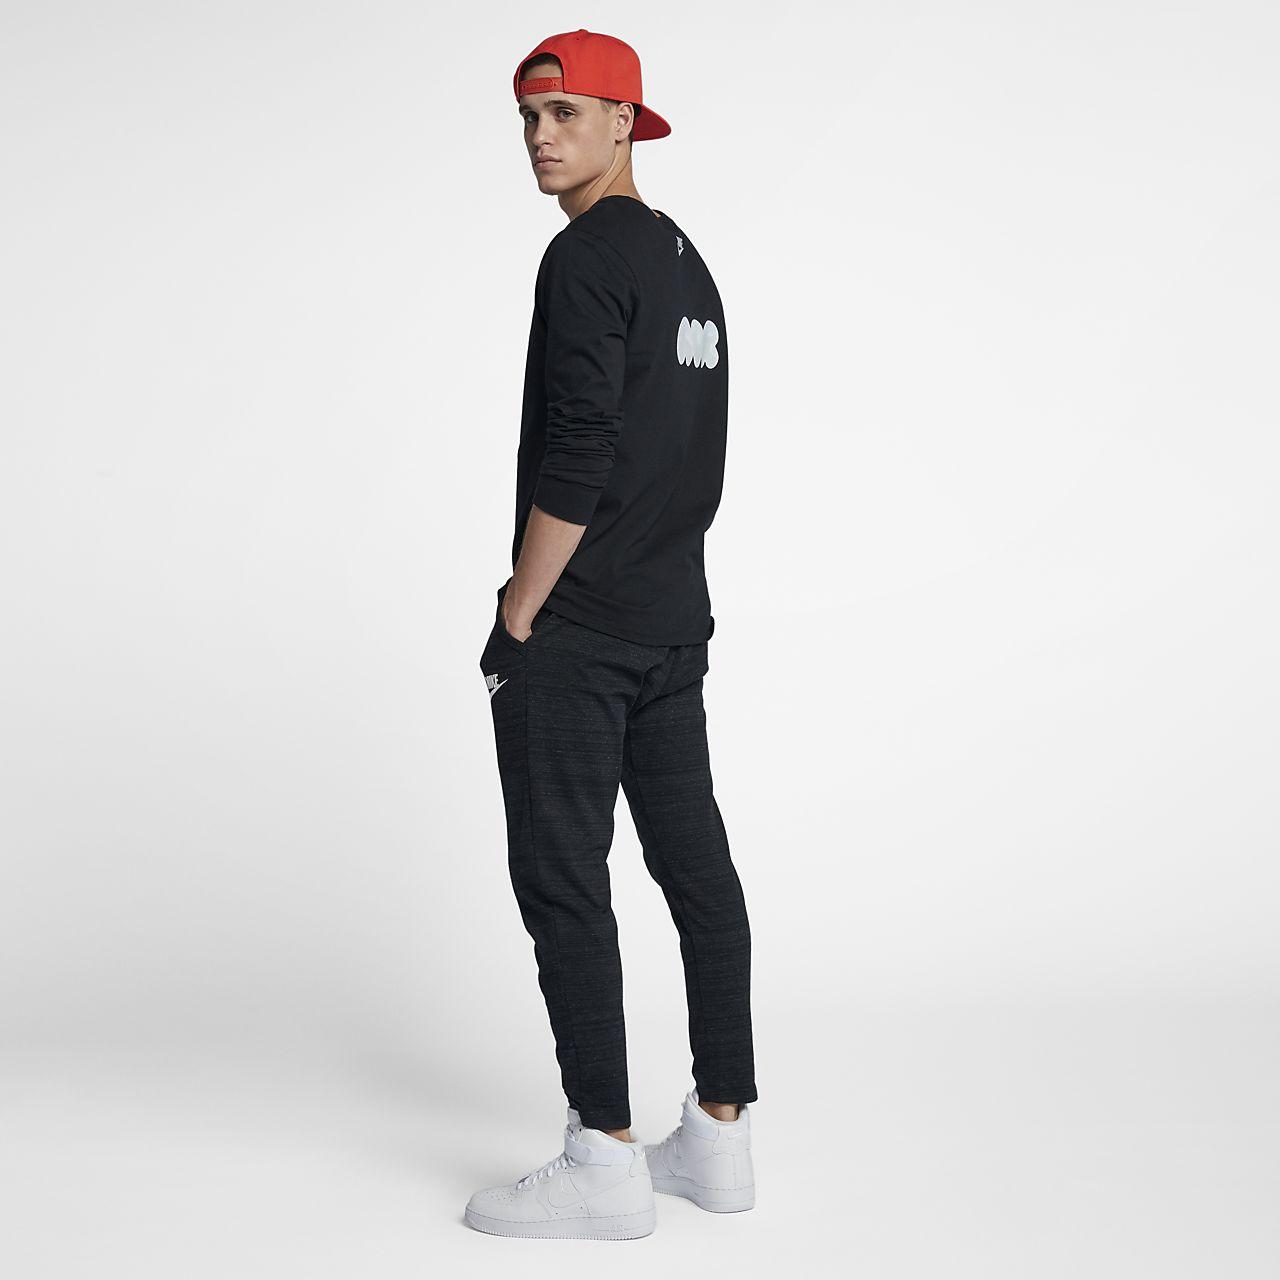 ... Nike Sportswear Advance 15 Men's Pants